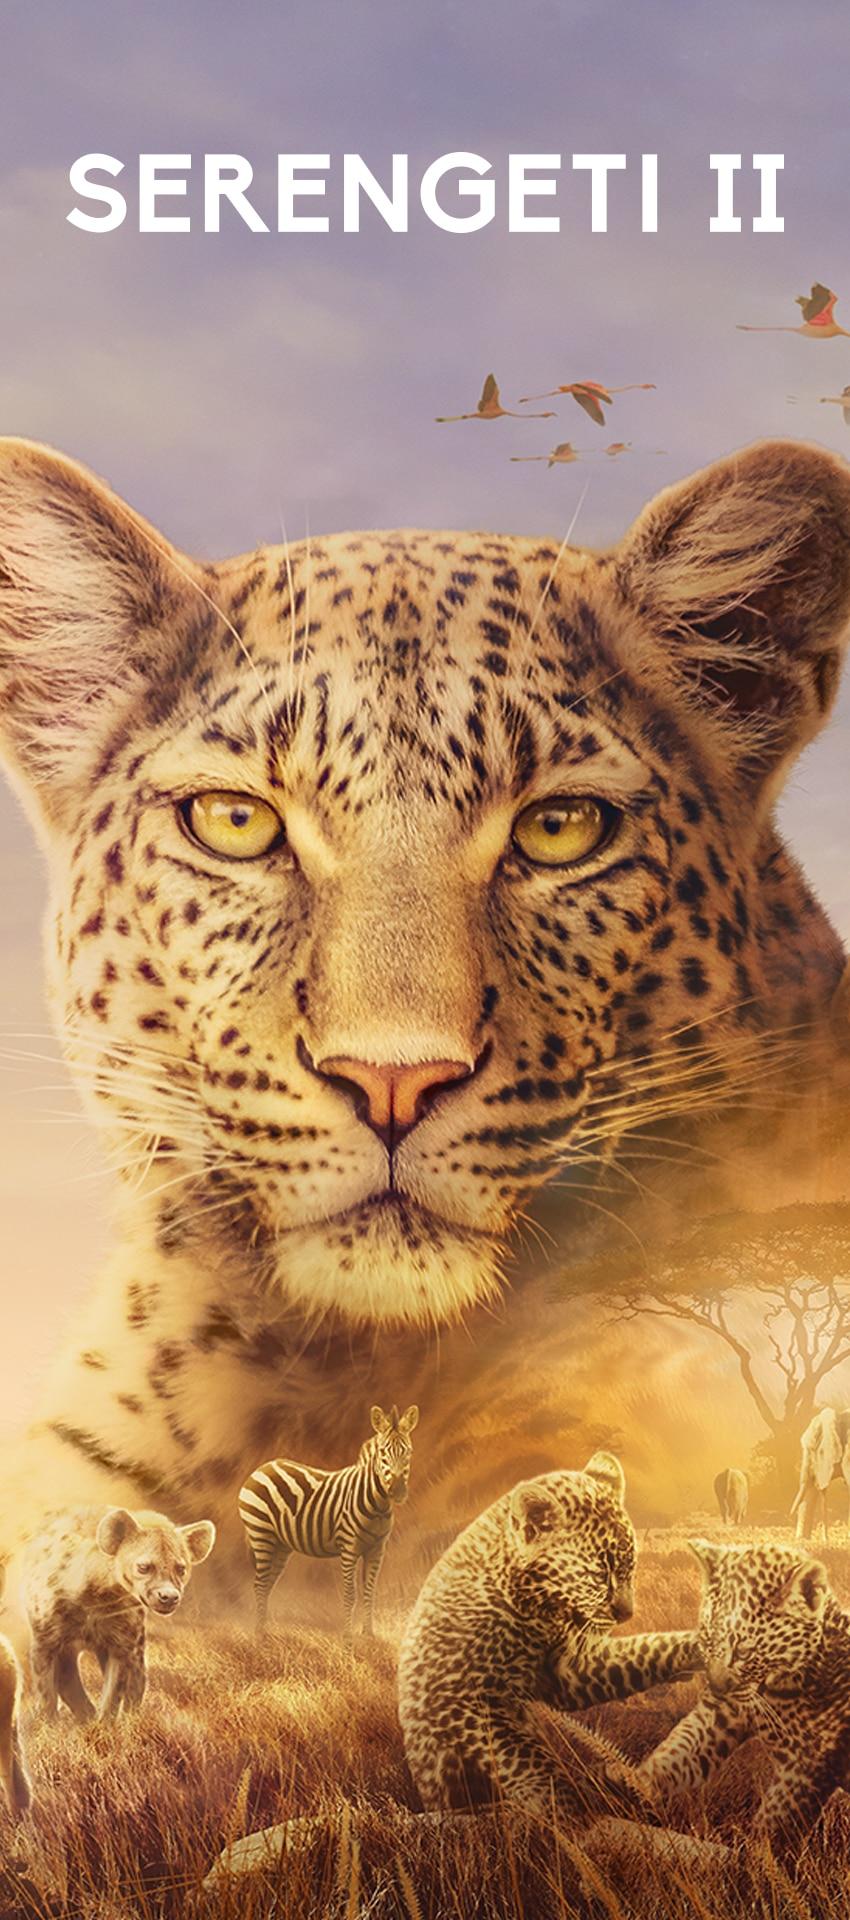 Serengeti II iconic